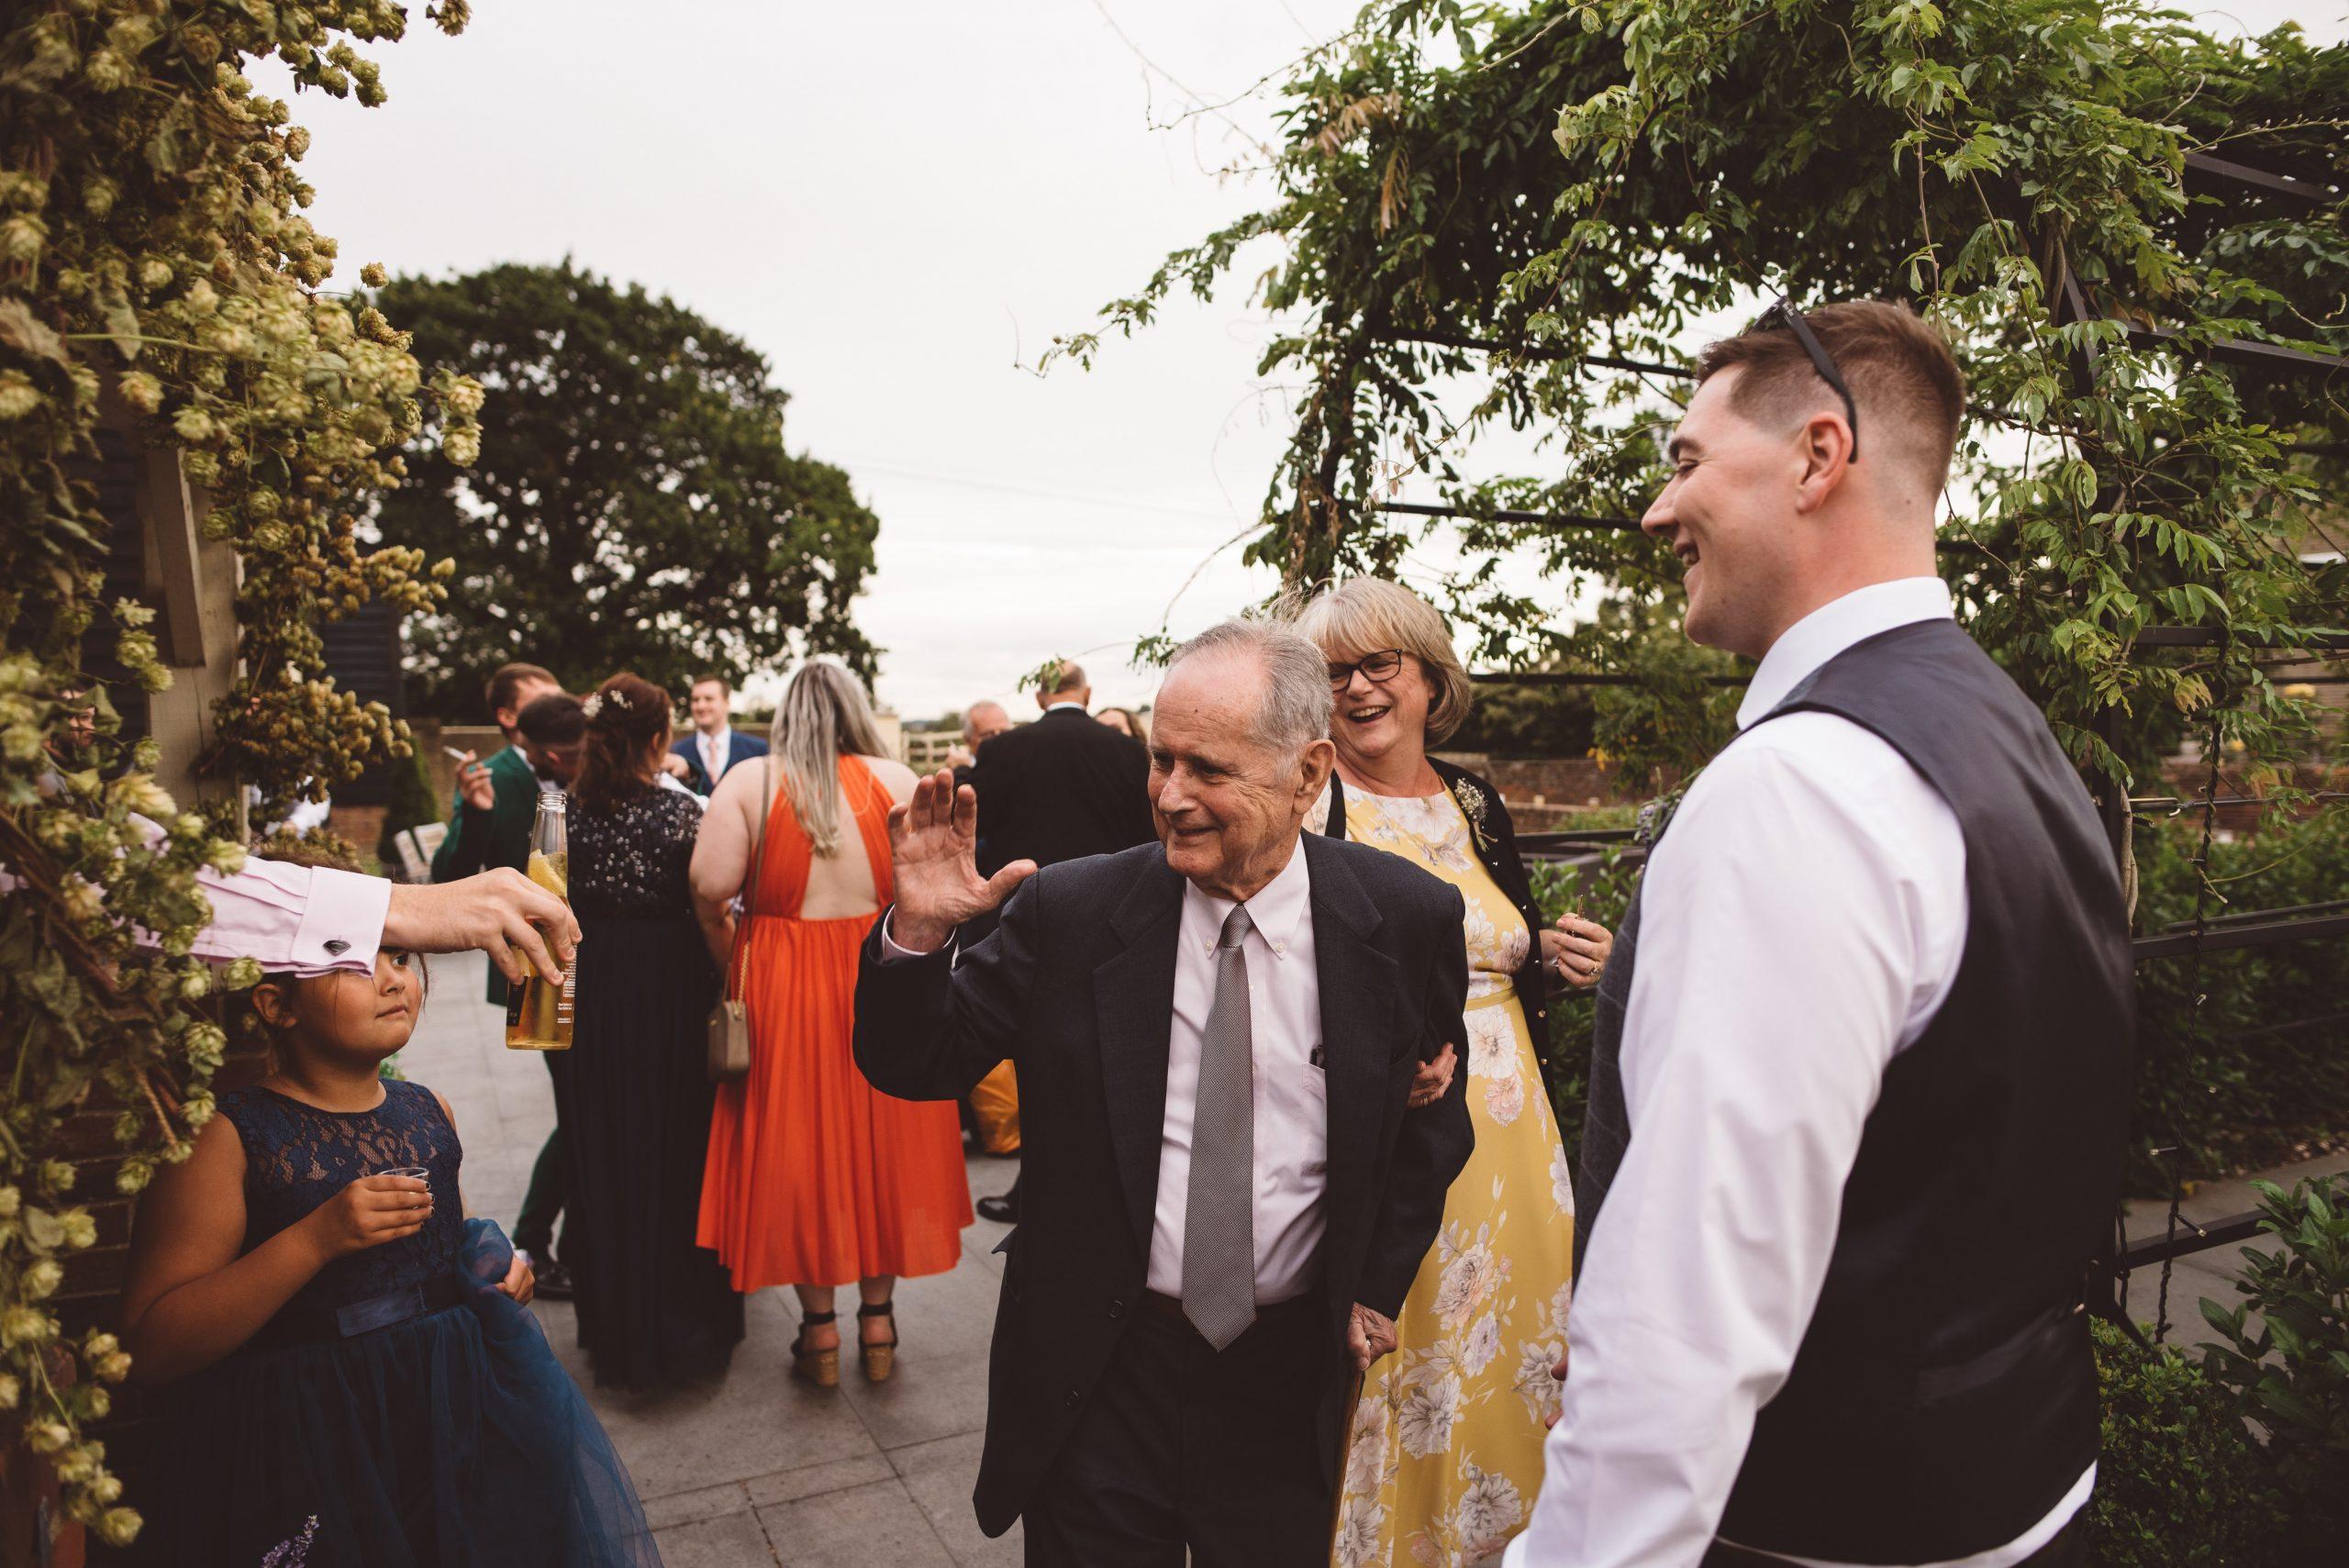 Natural wedding photo in Hertfordshire